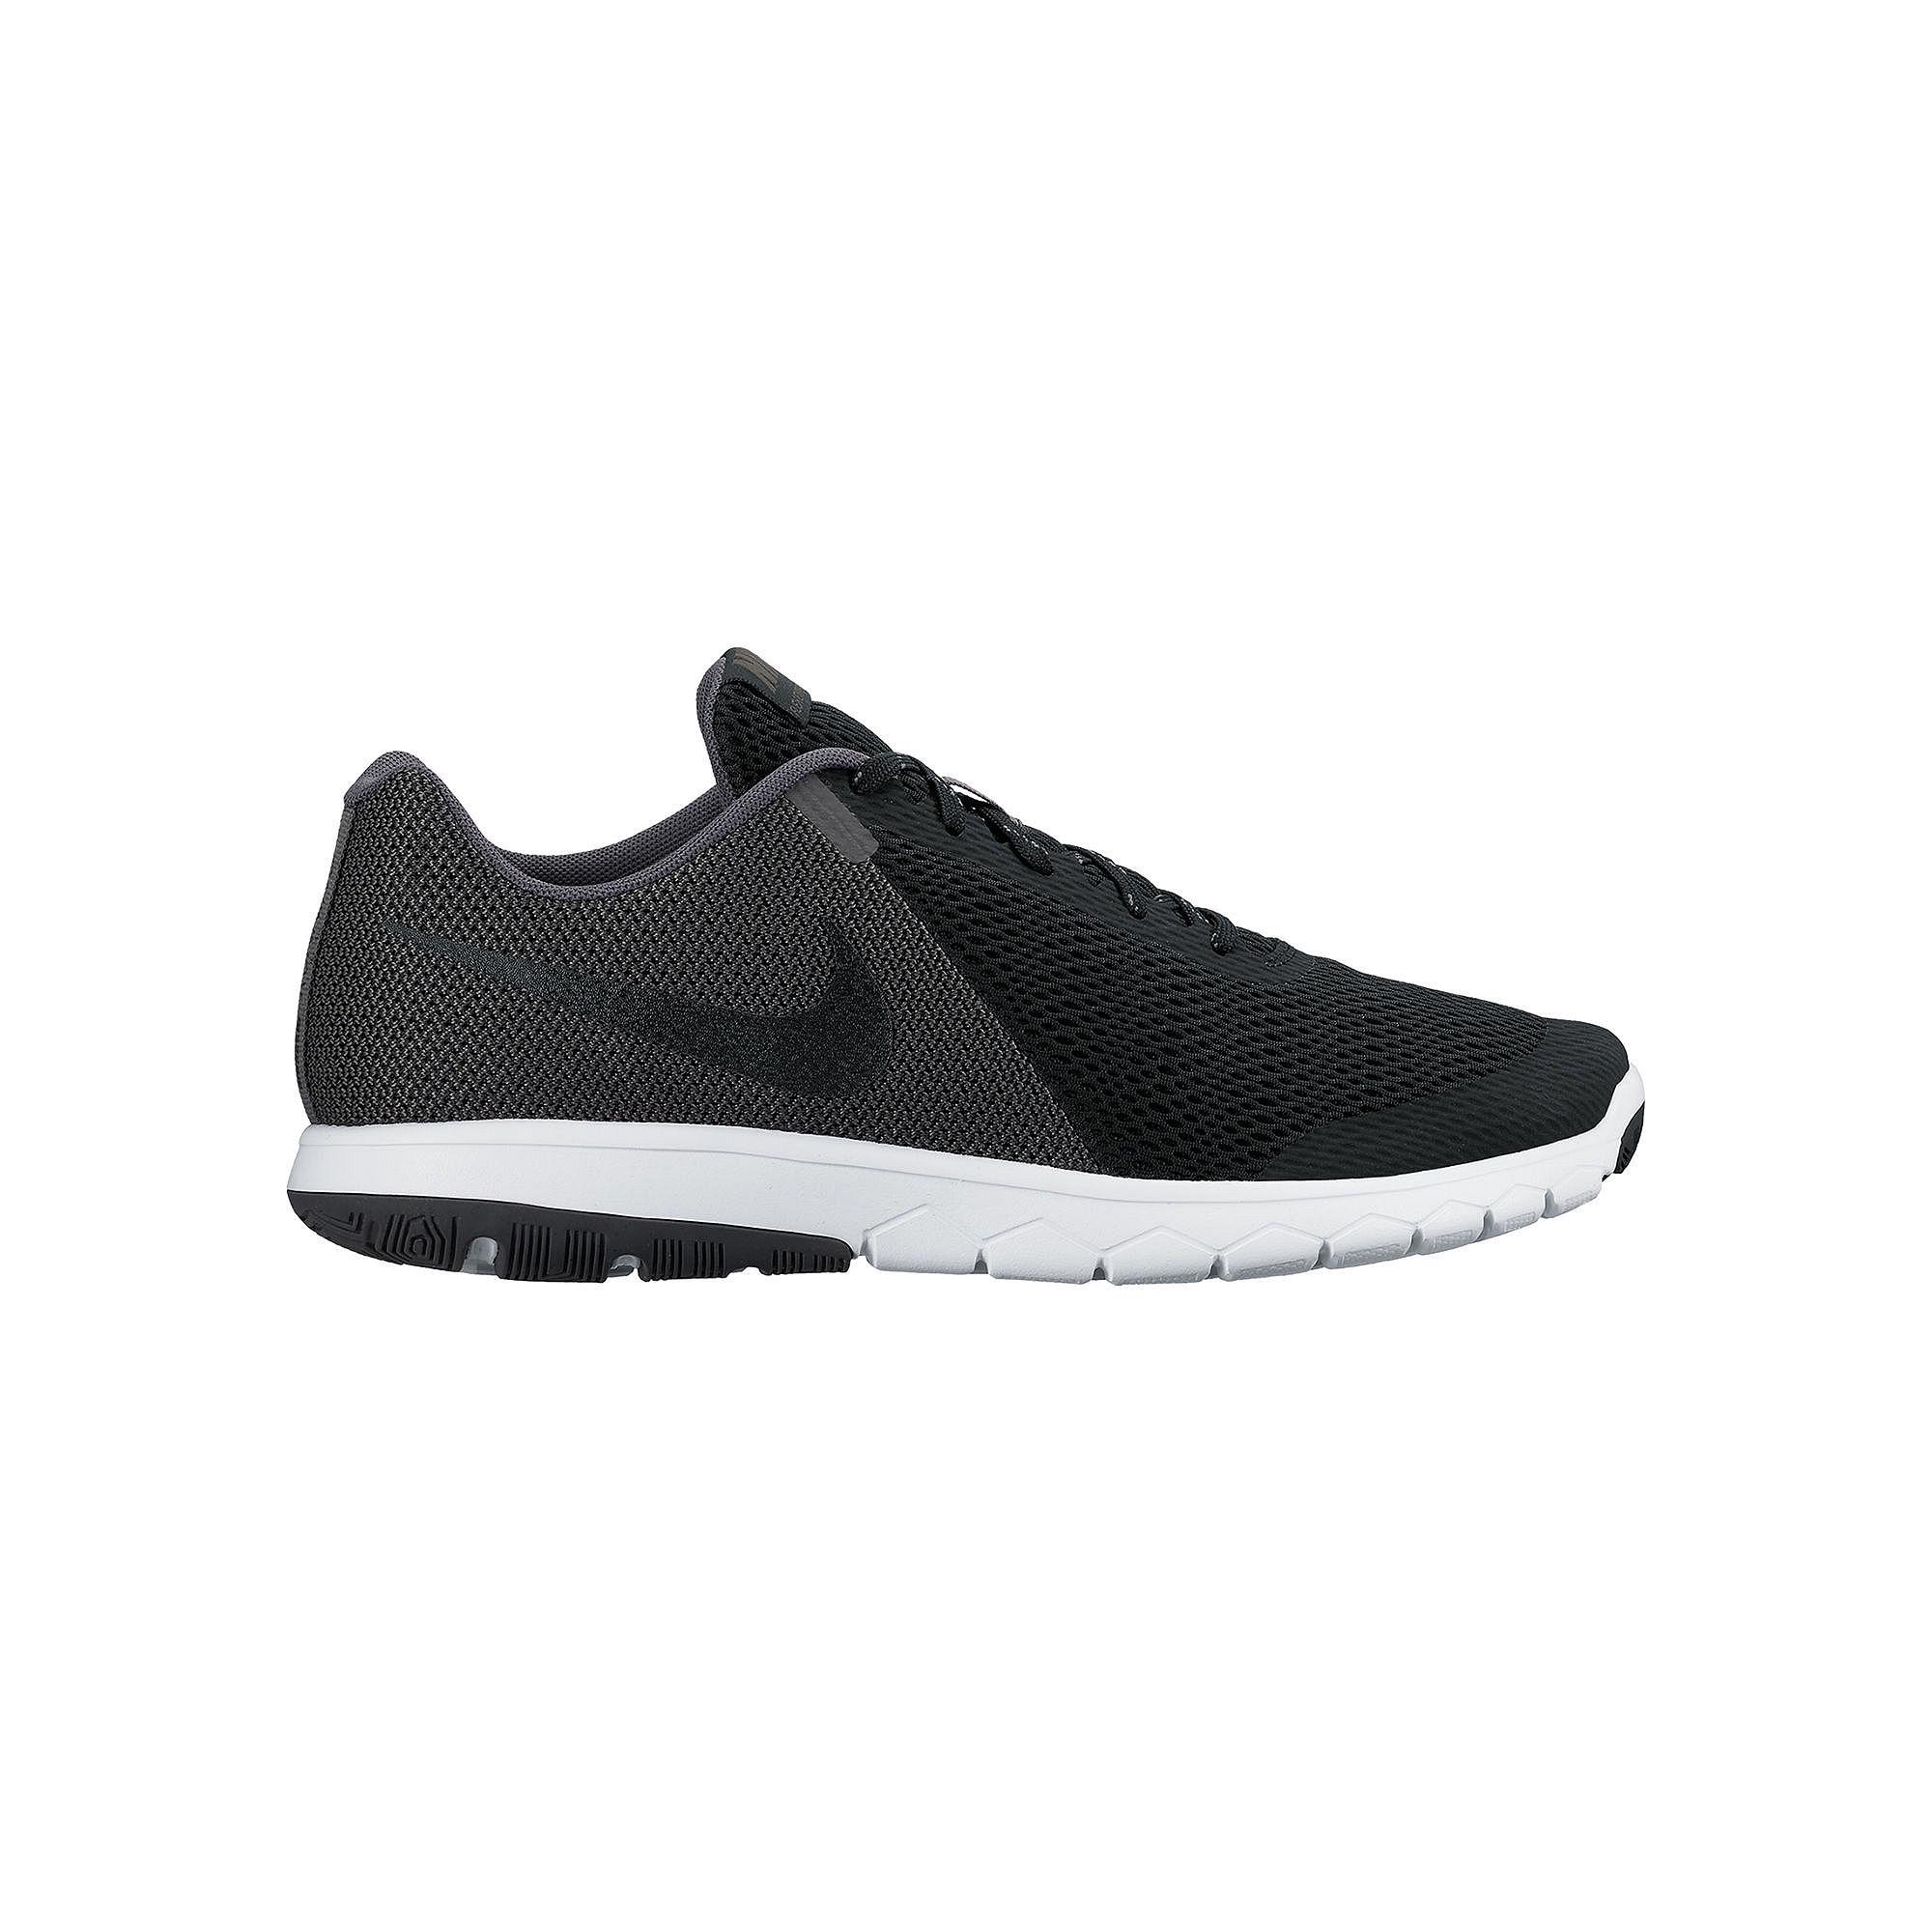 NEW NIKE FLEX EXPERIENCE RN 5 CRoss TRainig Running Shoes 844586 002